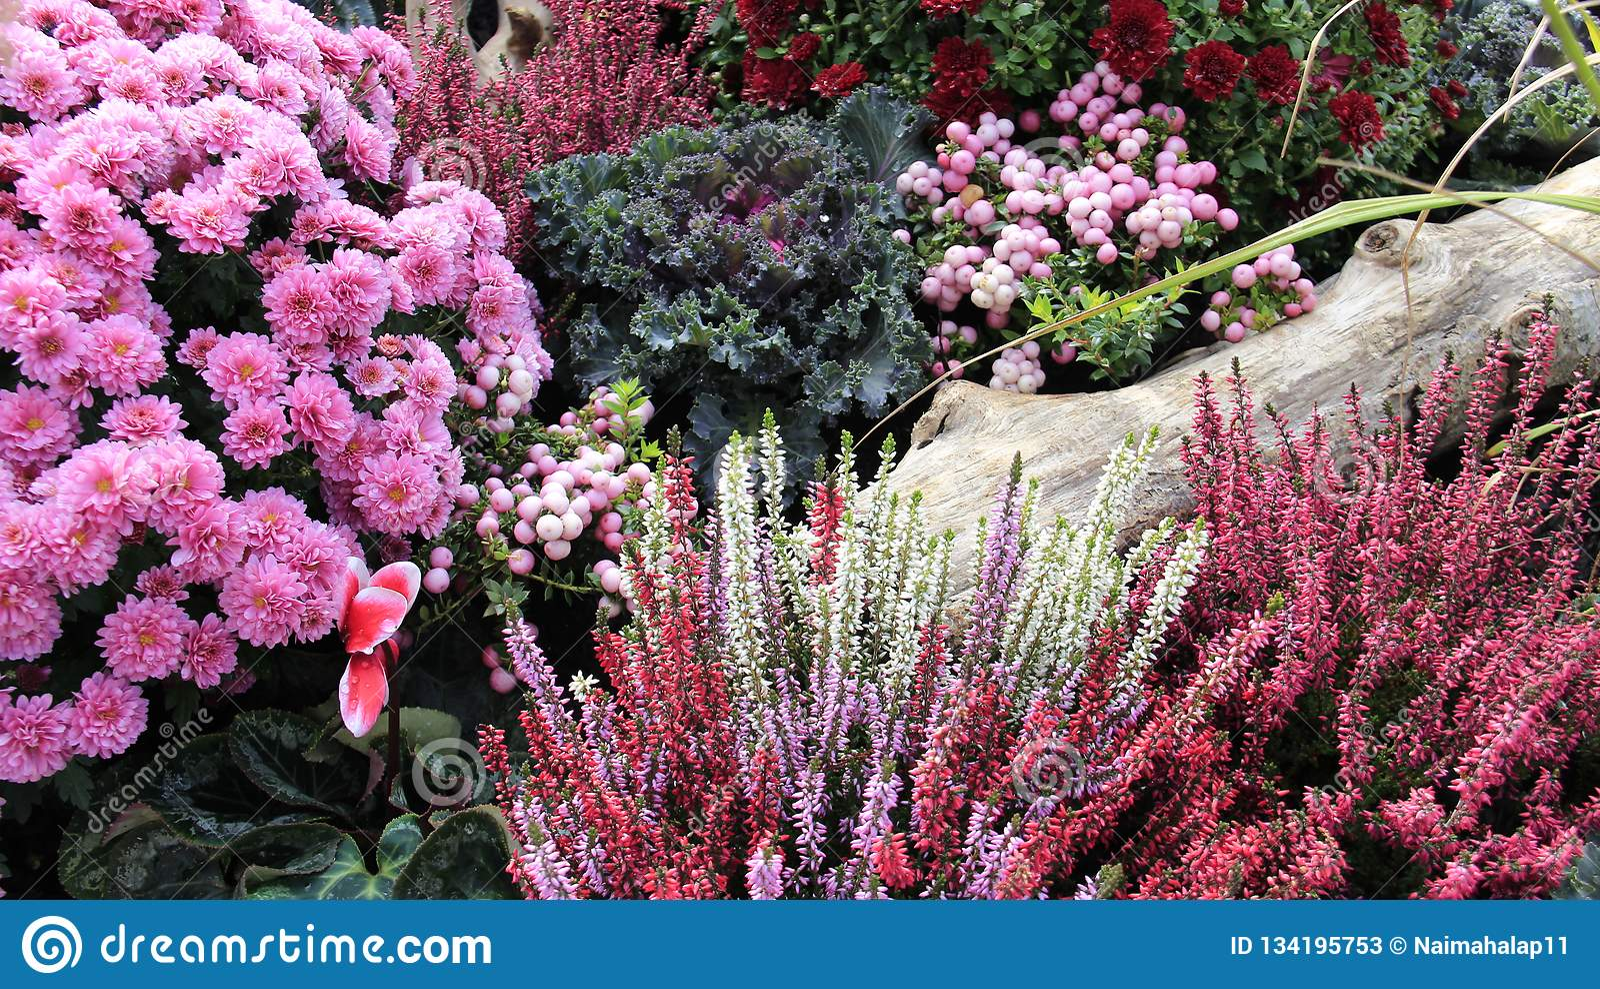 Mini Garden Sweet Flowering Blooming Pink Violet Chrysanthemums